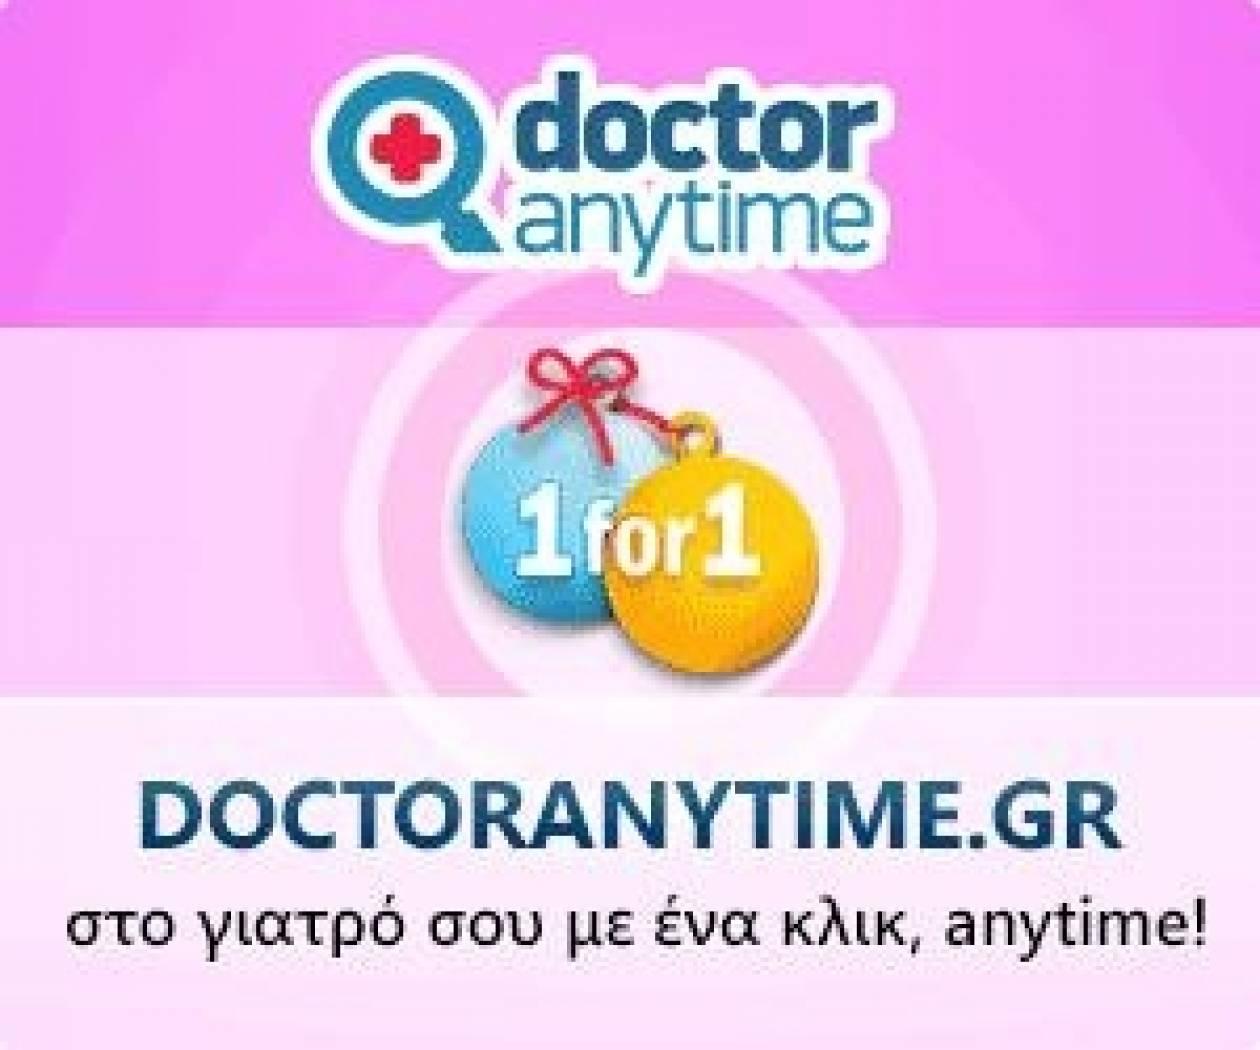 Doctoranytime.gr – Μια απλή εξίσωση αγάπης